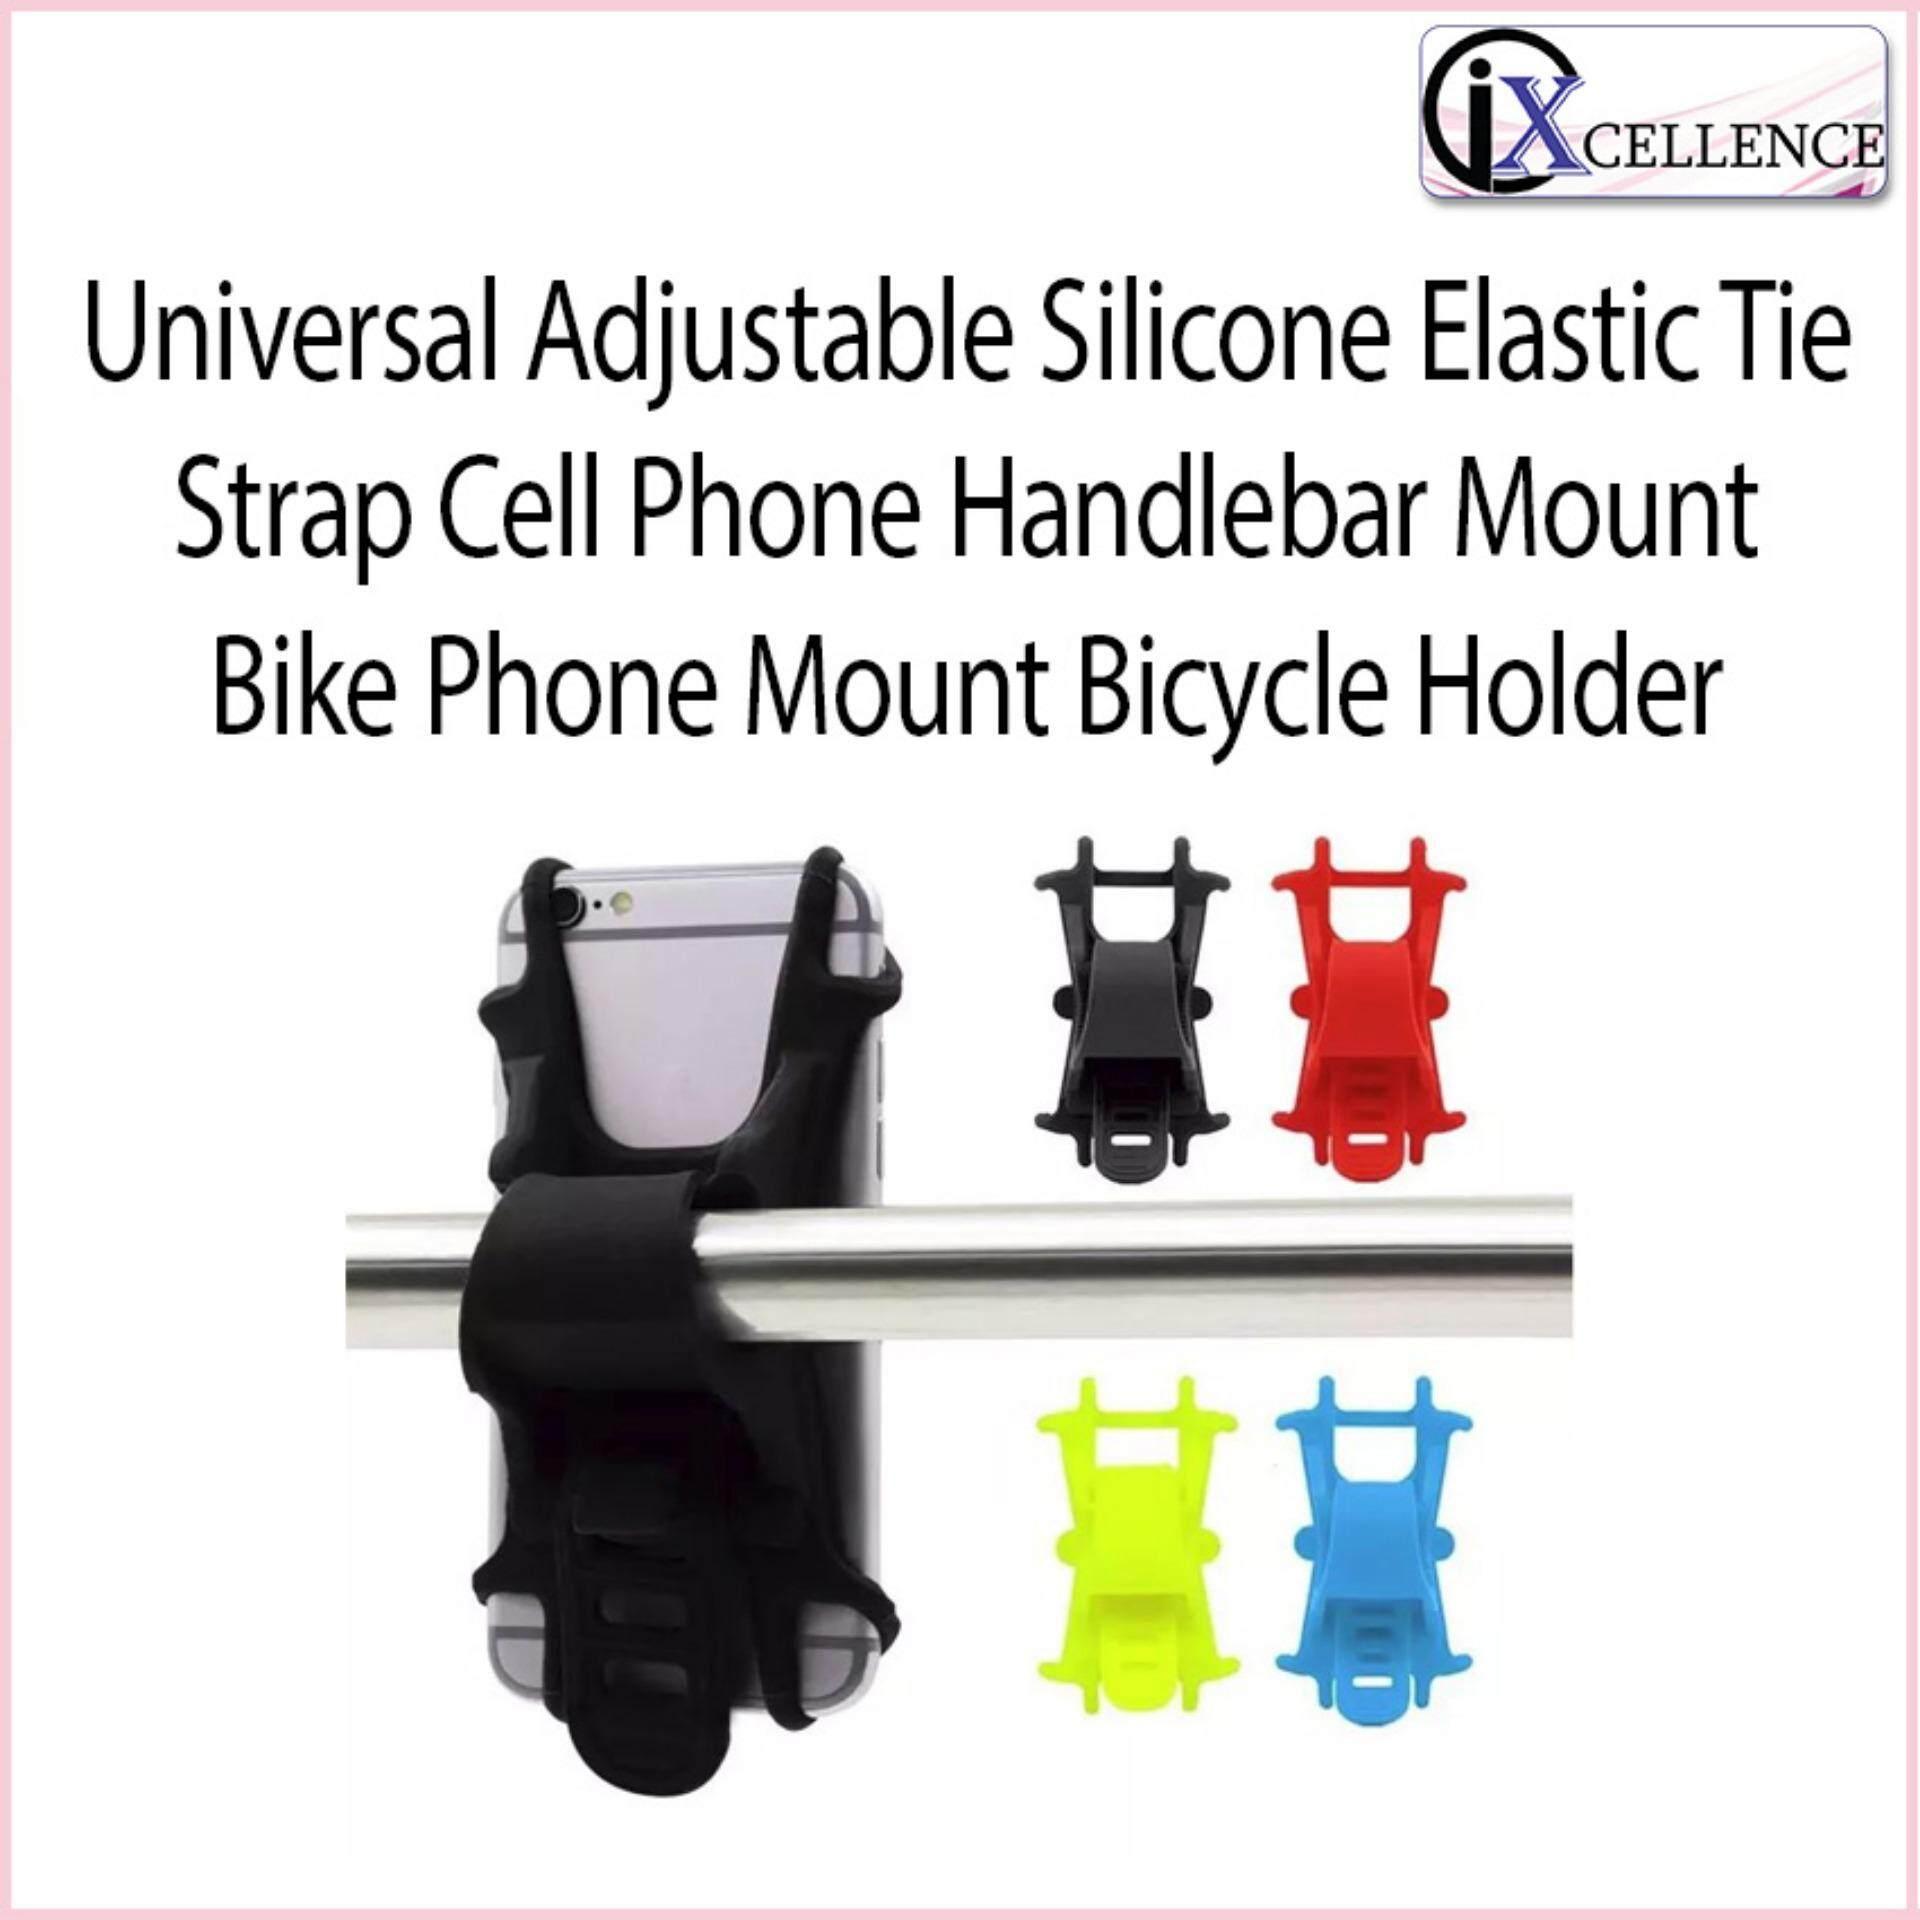 [IX] Universal Adjustable Silicone Elastic Tie Strap Cell Phone Handlebar Mount Bike Phone Mount Bicycle Holder